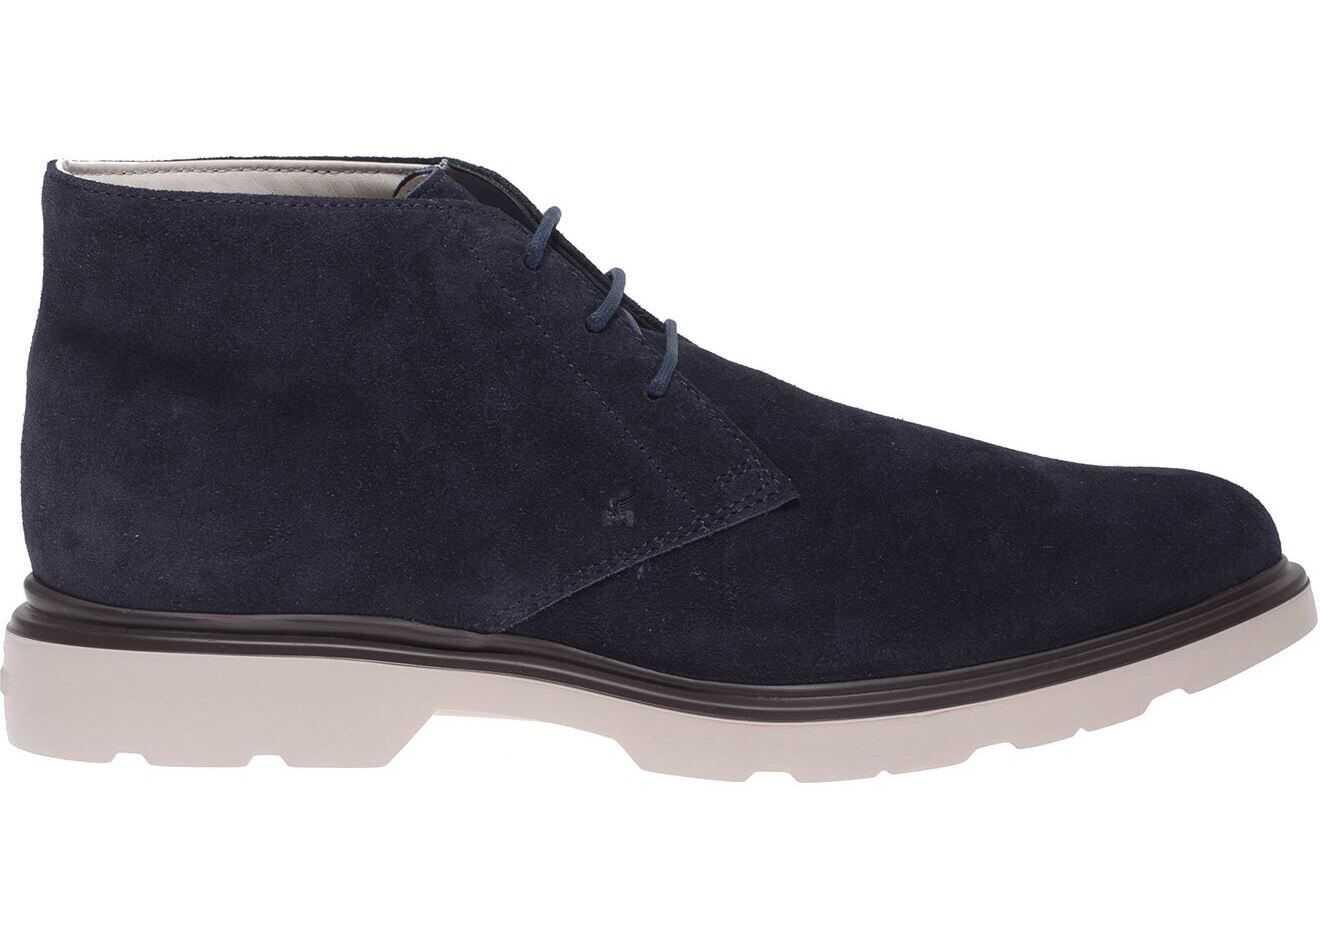 Hogan Blue Suede Desert Boots HXM3930W355HG0U801 Blue imagine b-mall.ro